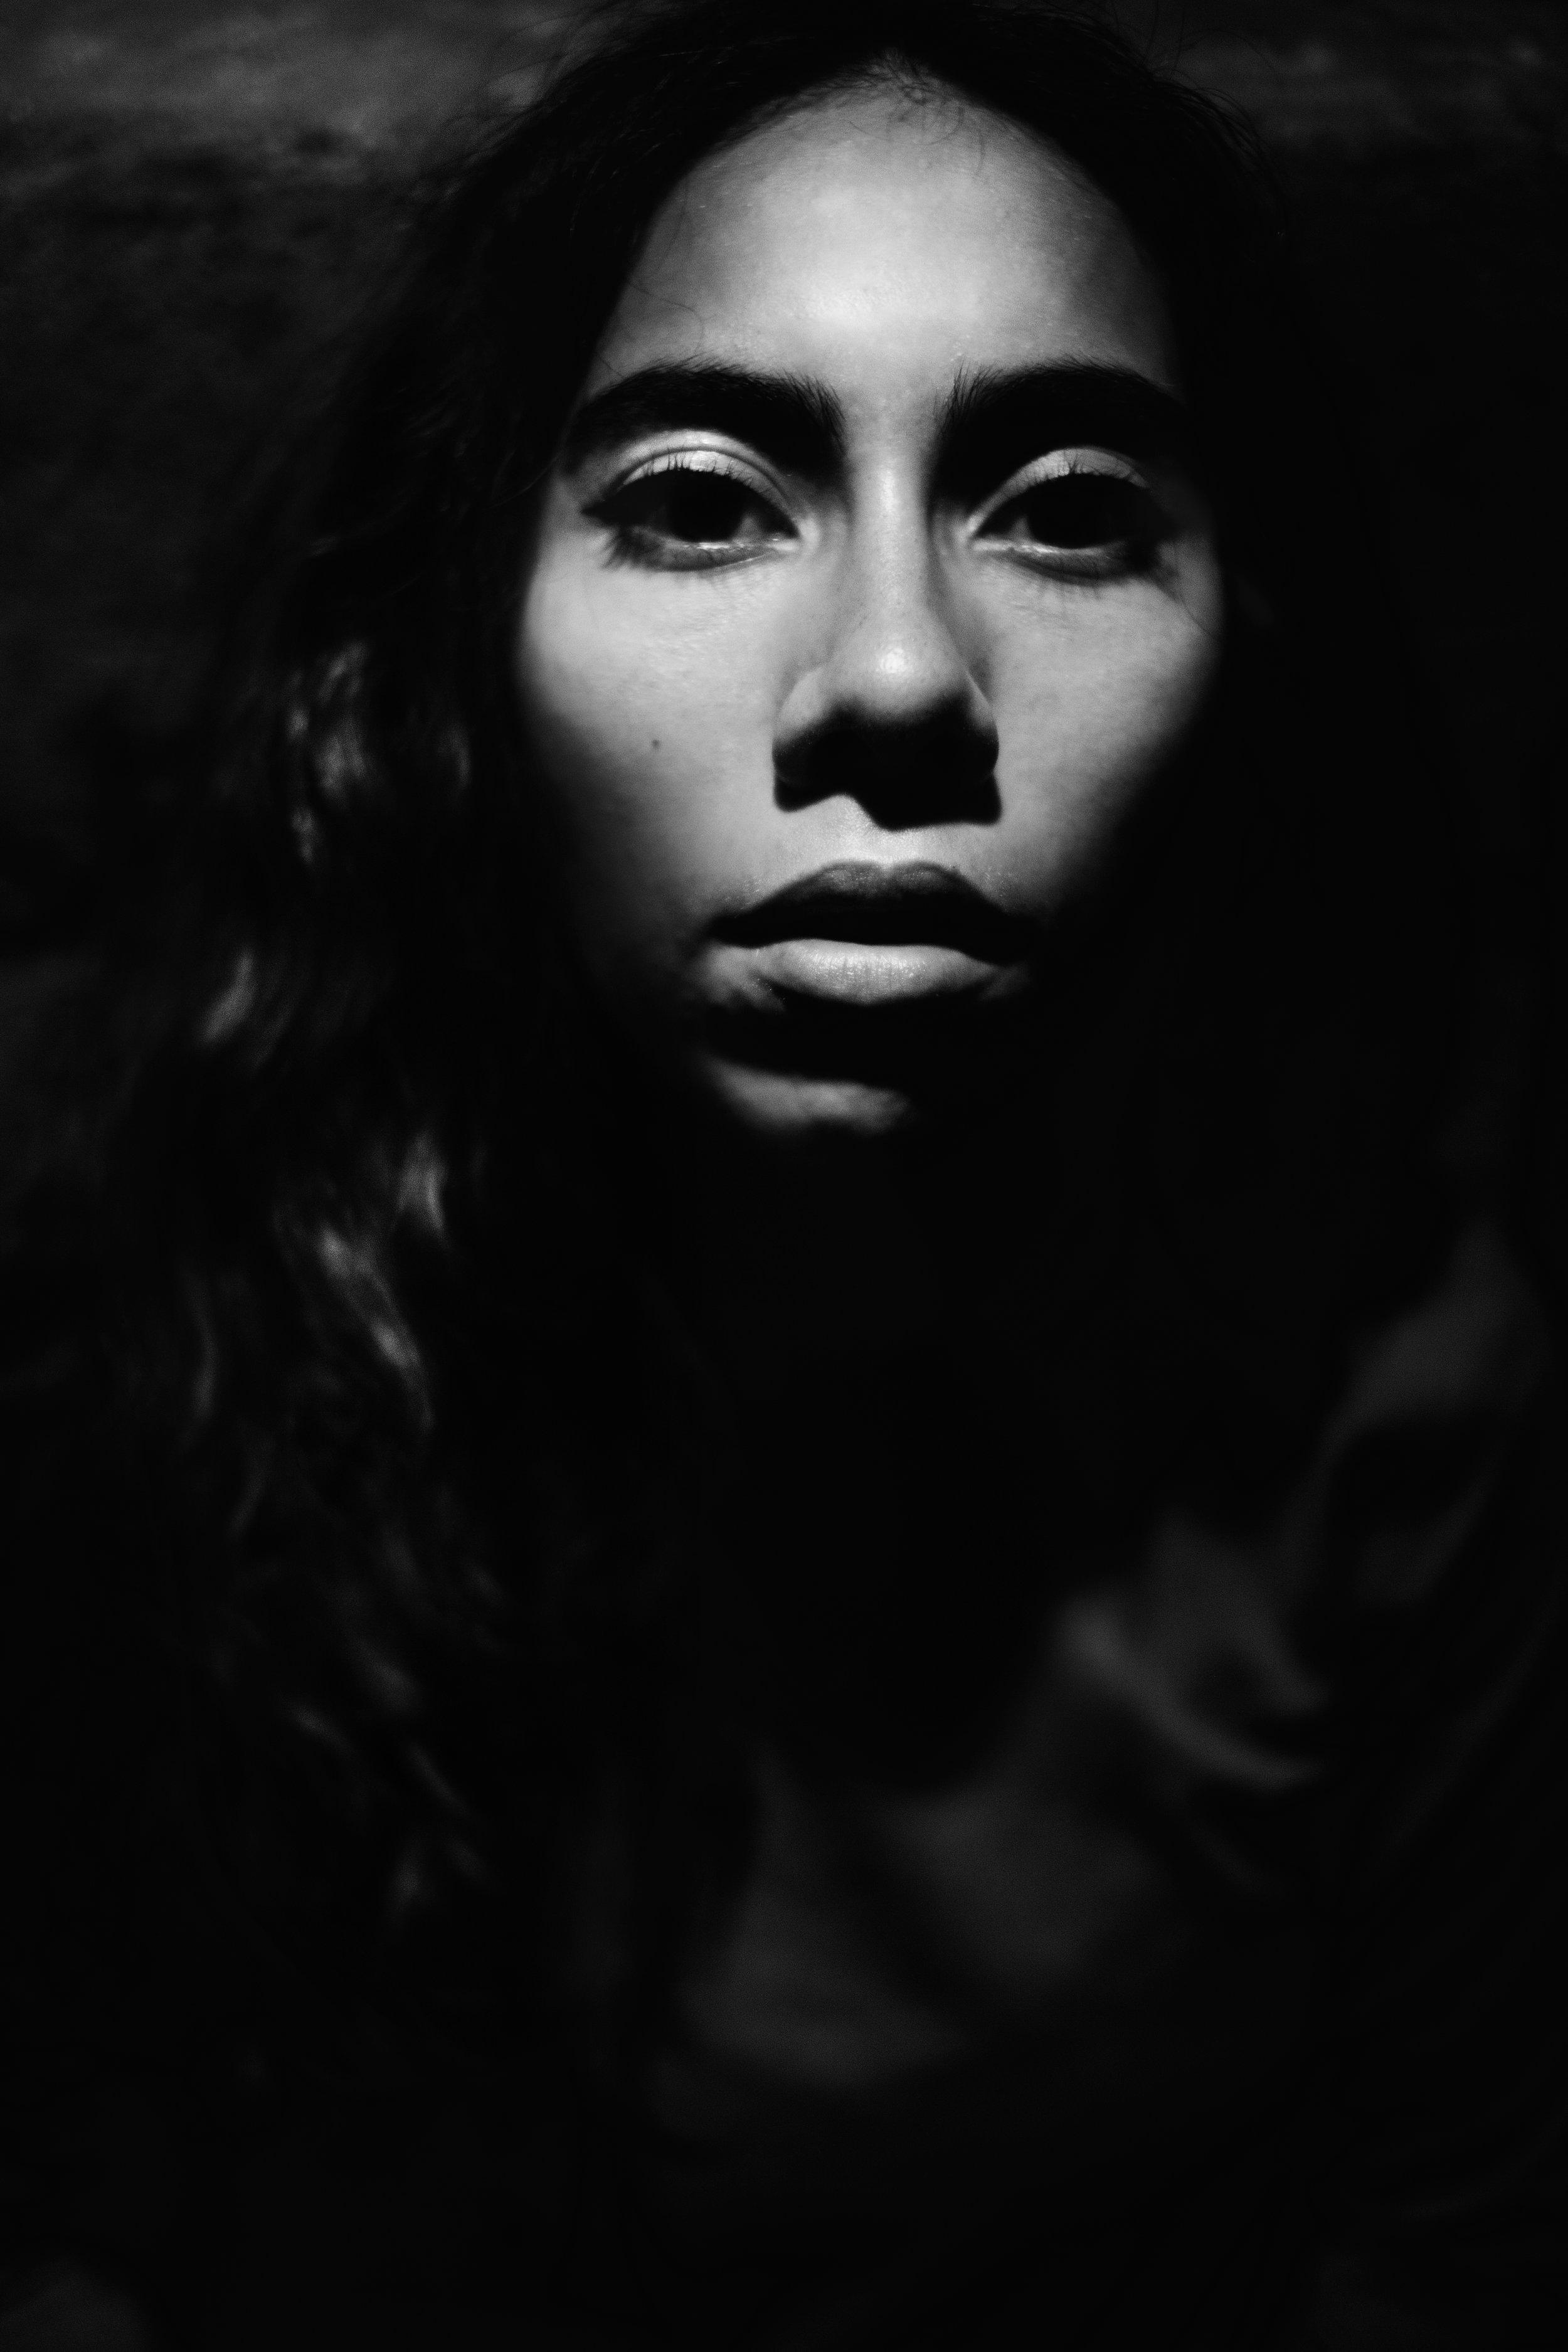 Photographer Viv Delgadillo